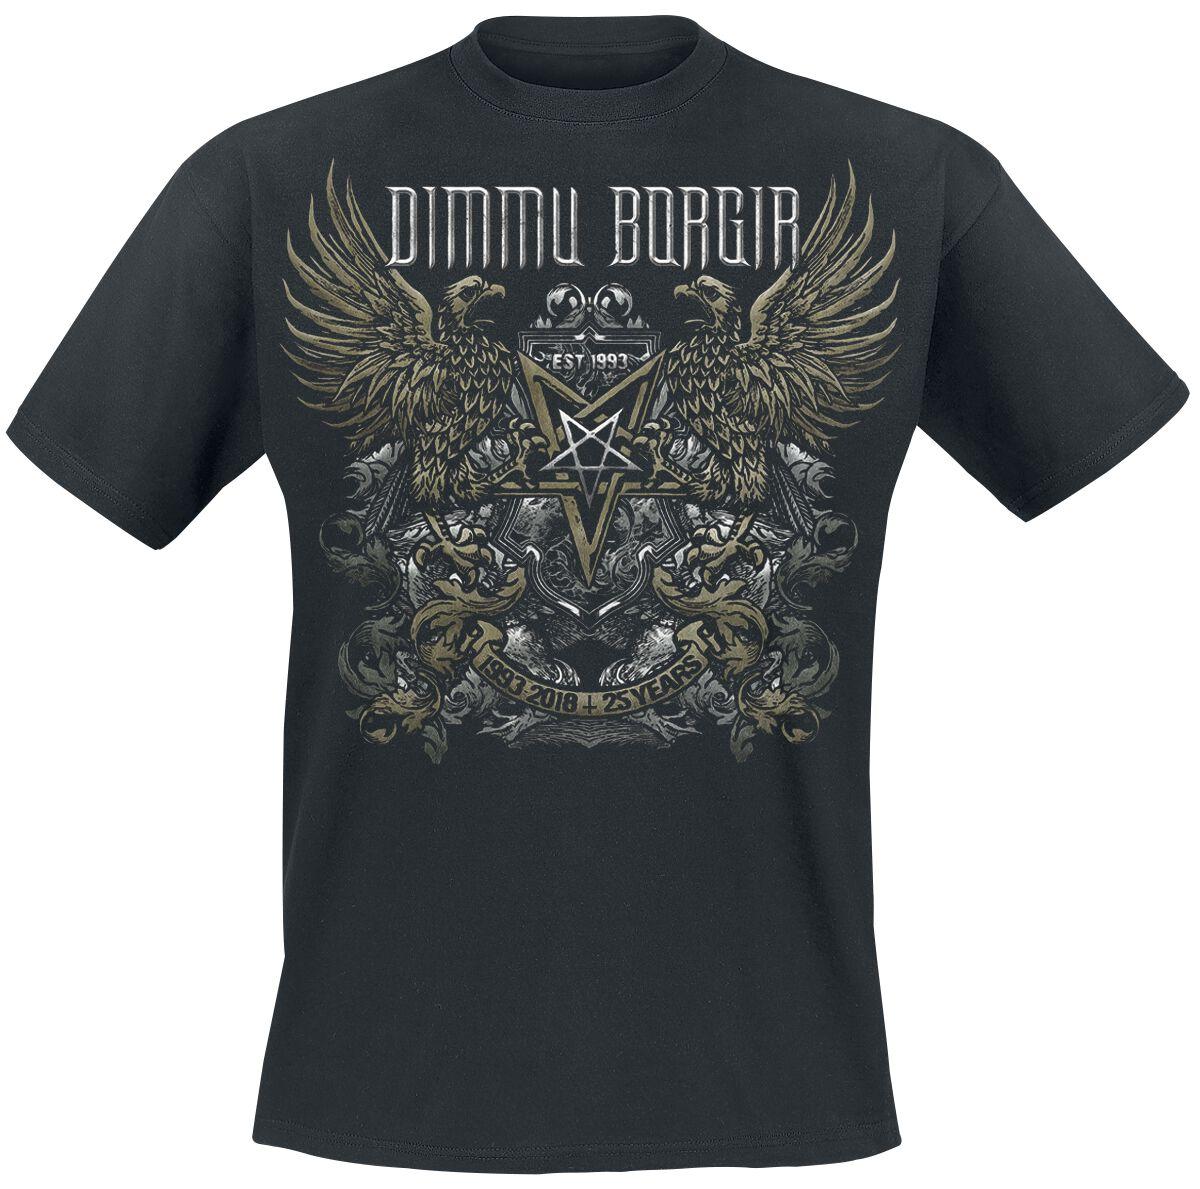 Zespoły - Koszulki - T-Shirt Dimmu Borgir 25 Years T-Shirt czarny - 375220